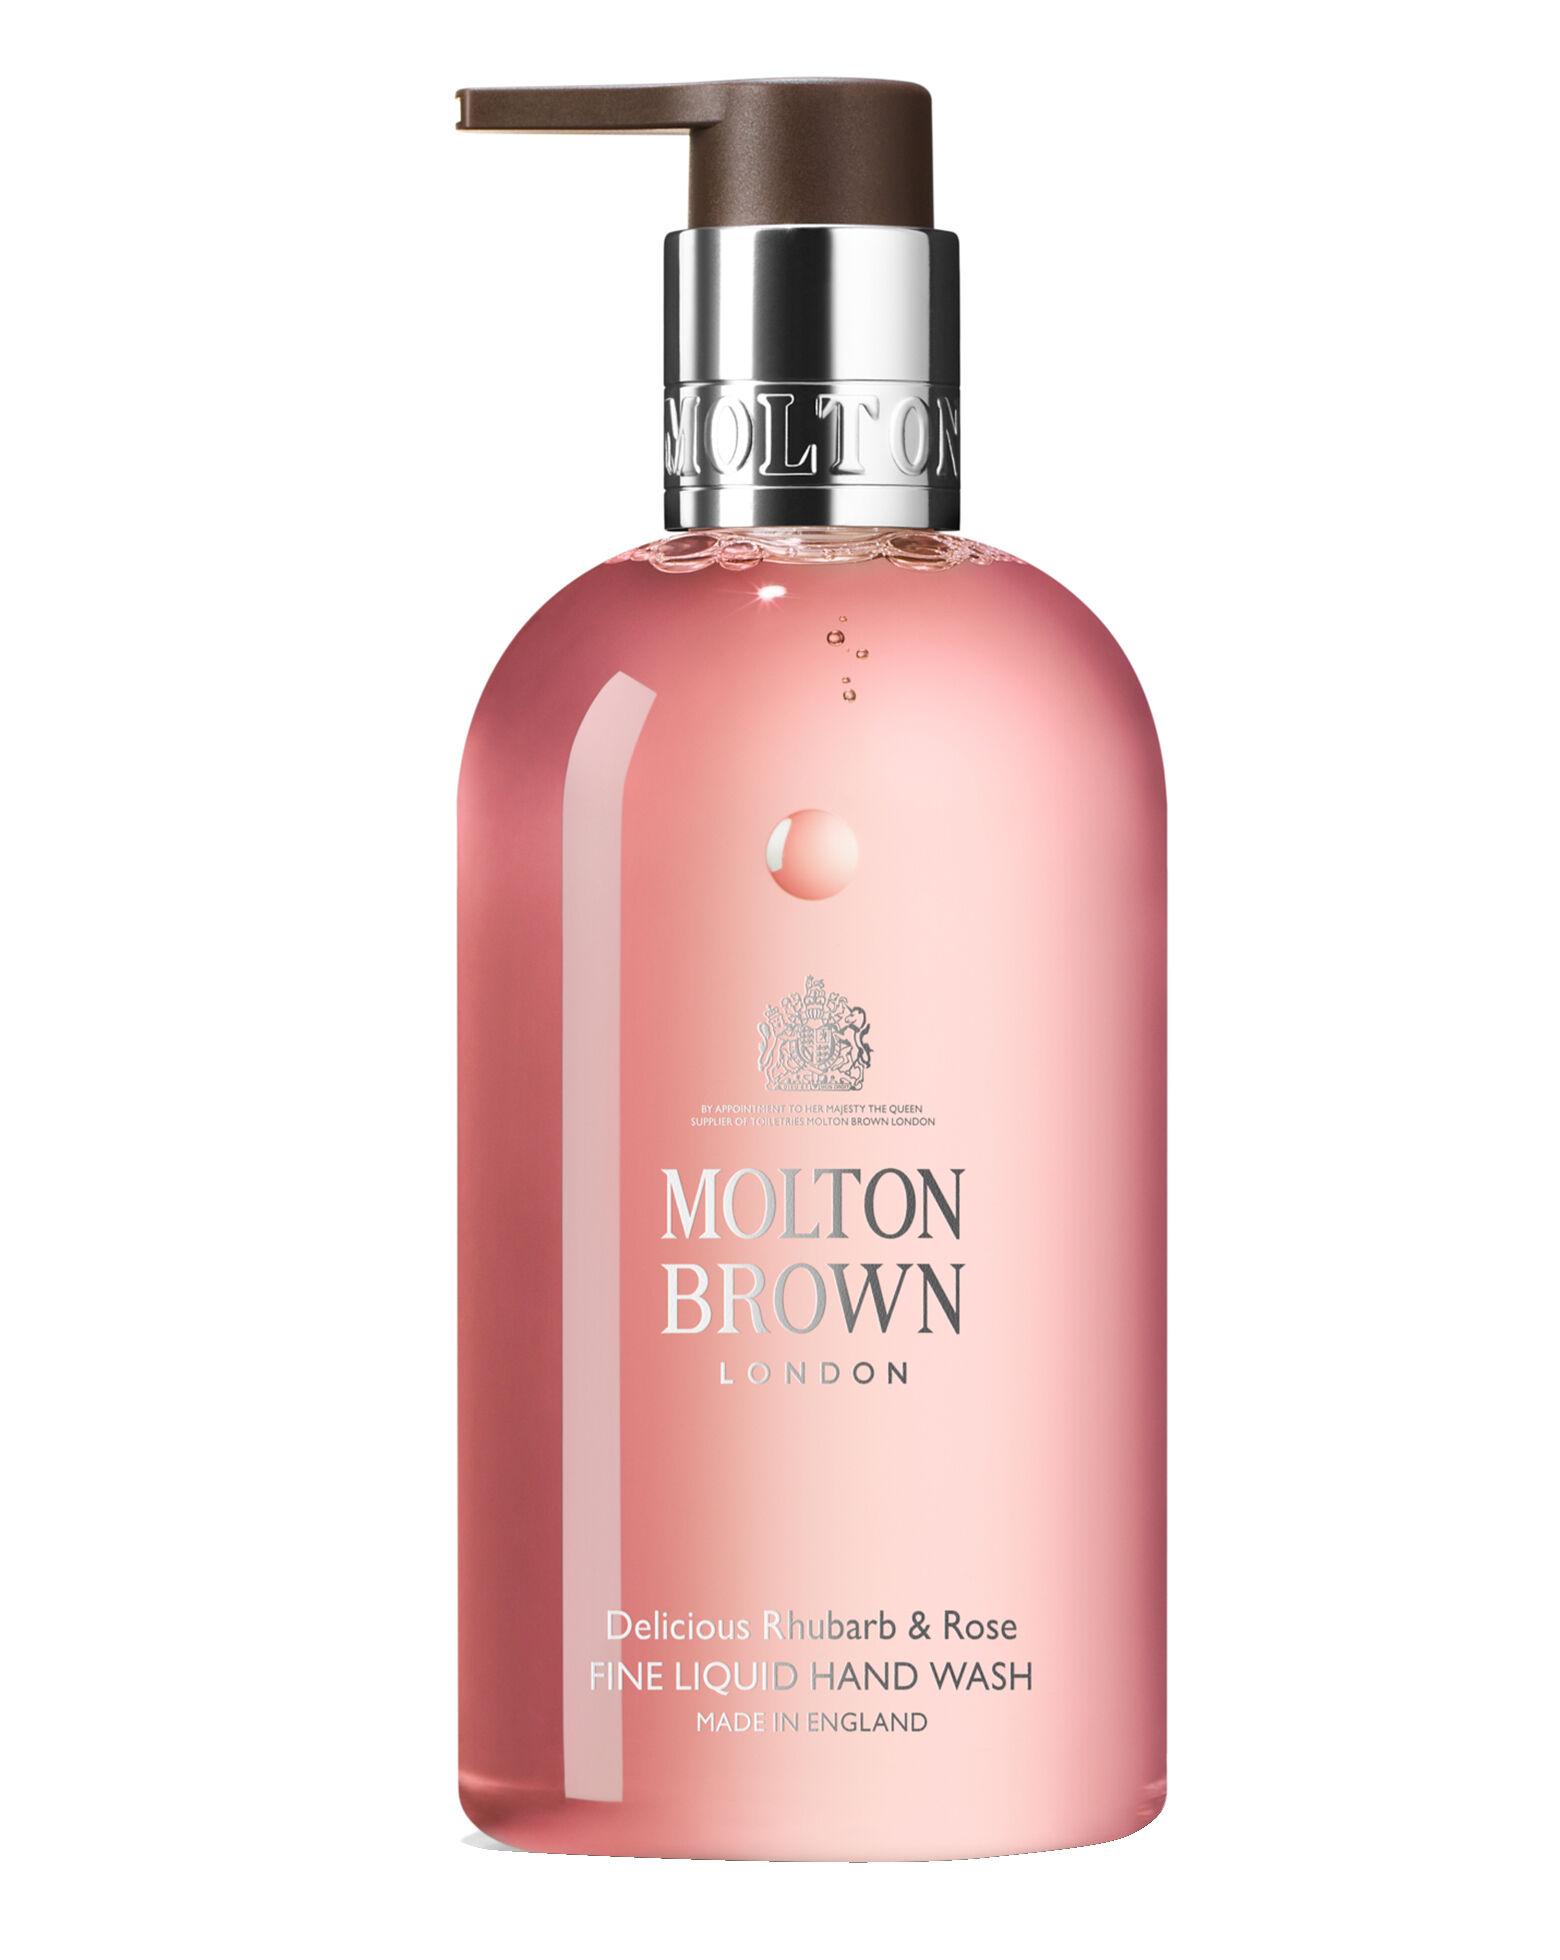 MOLTON BROWN - Delicious Rhubarb & Rose Fine Liquid Hand Wash